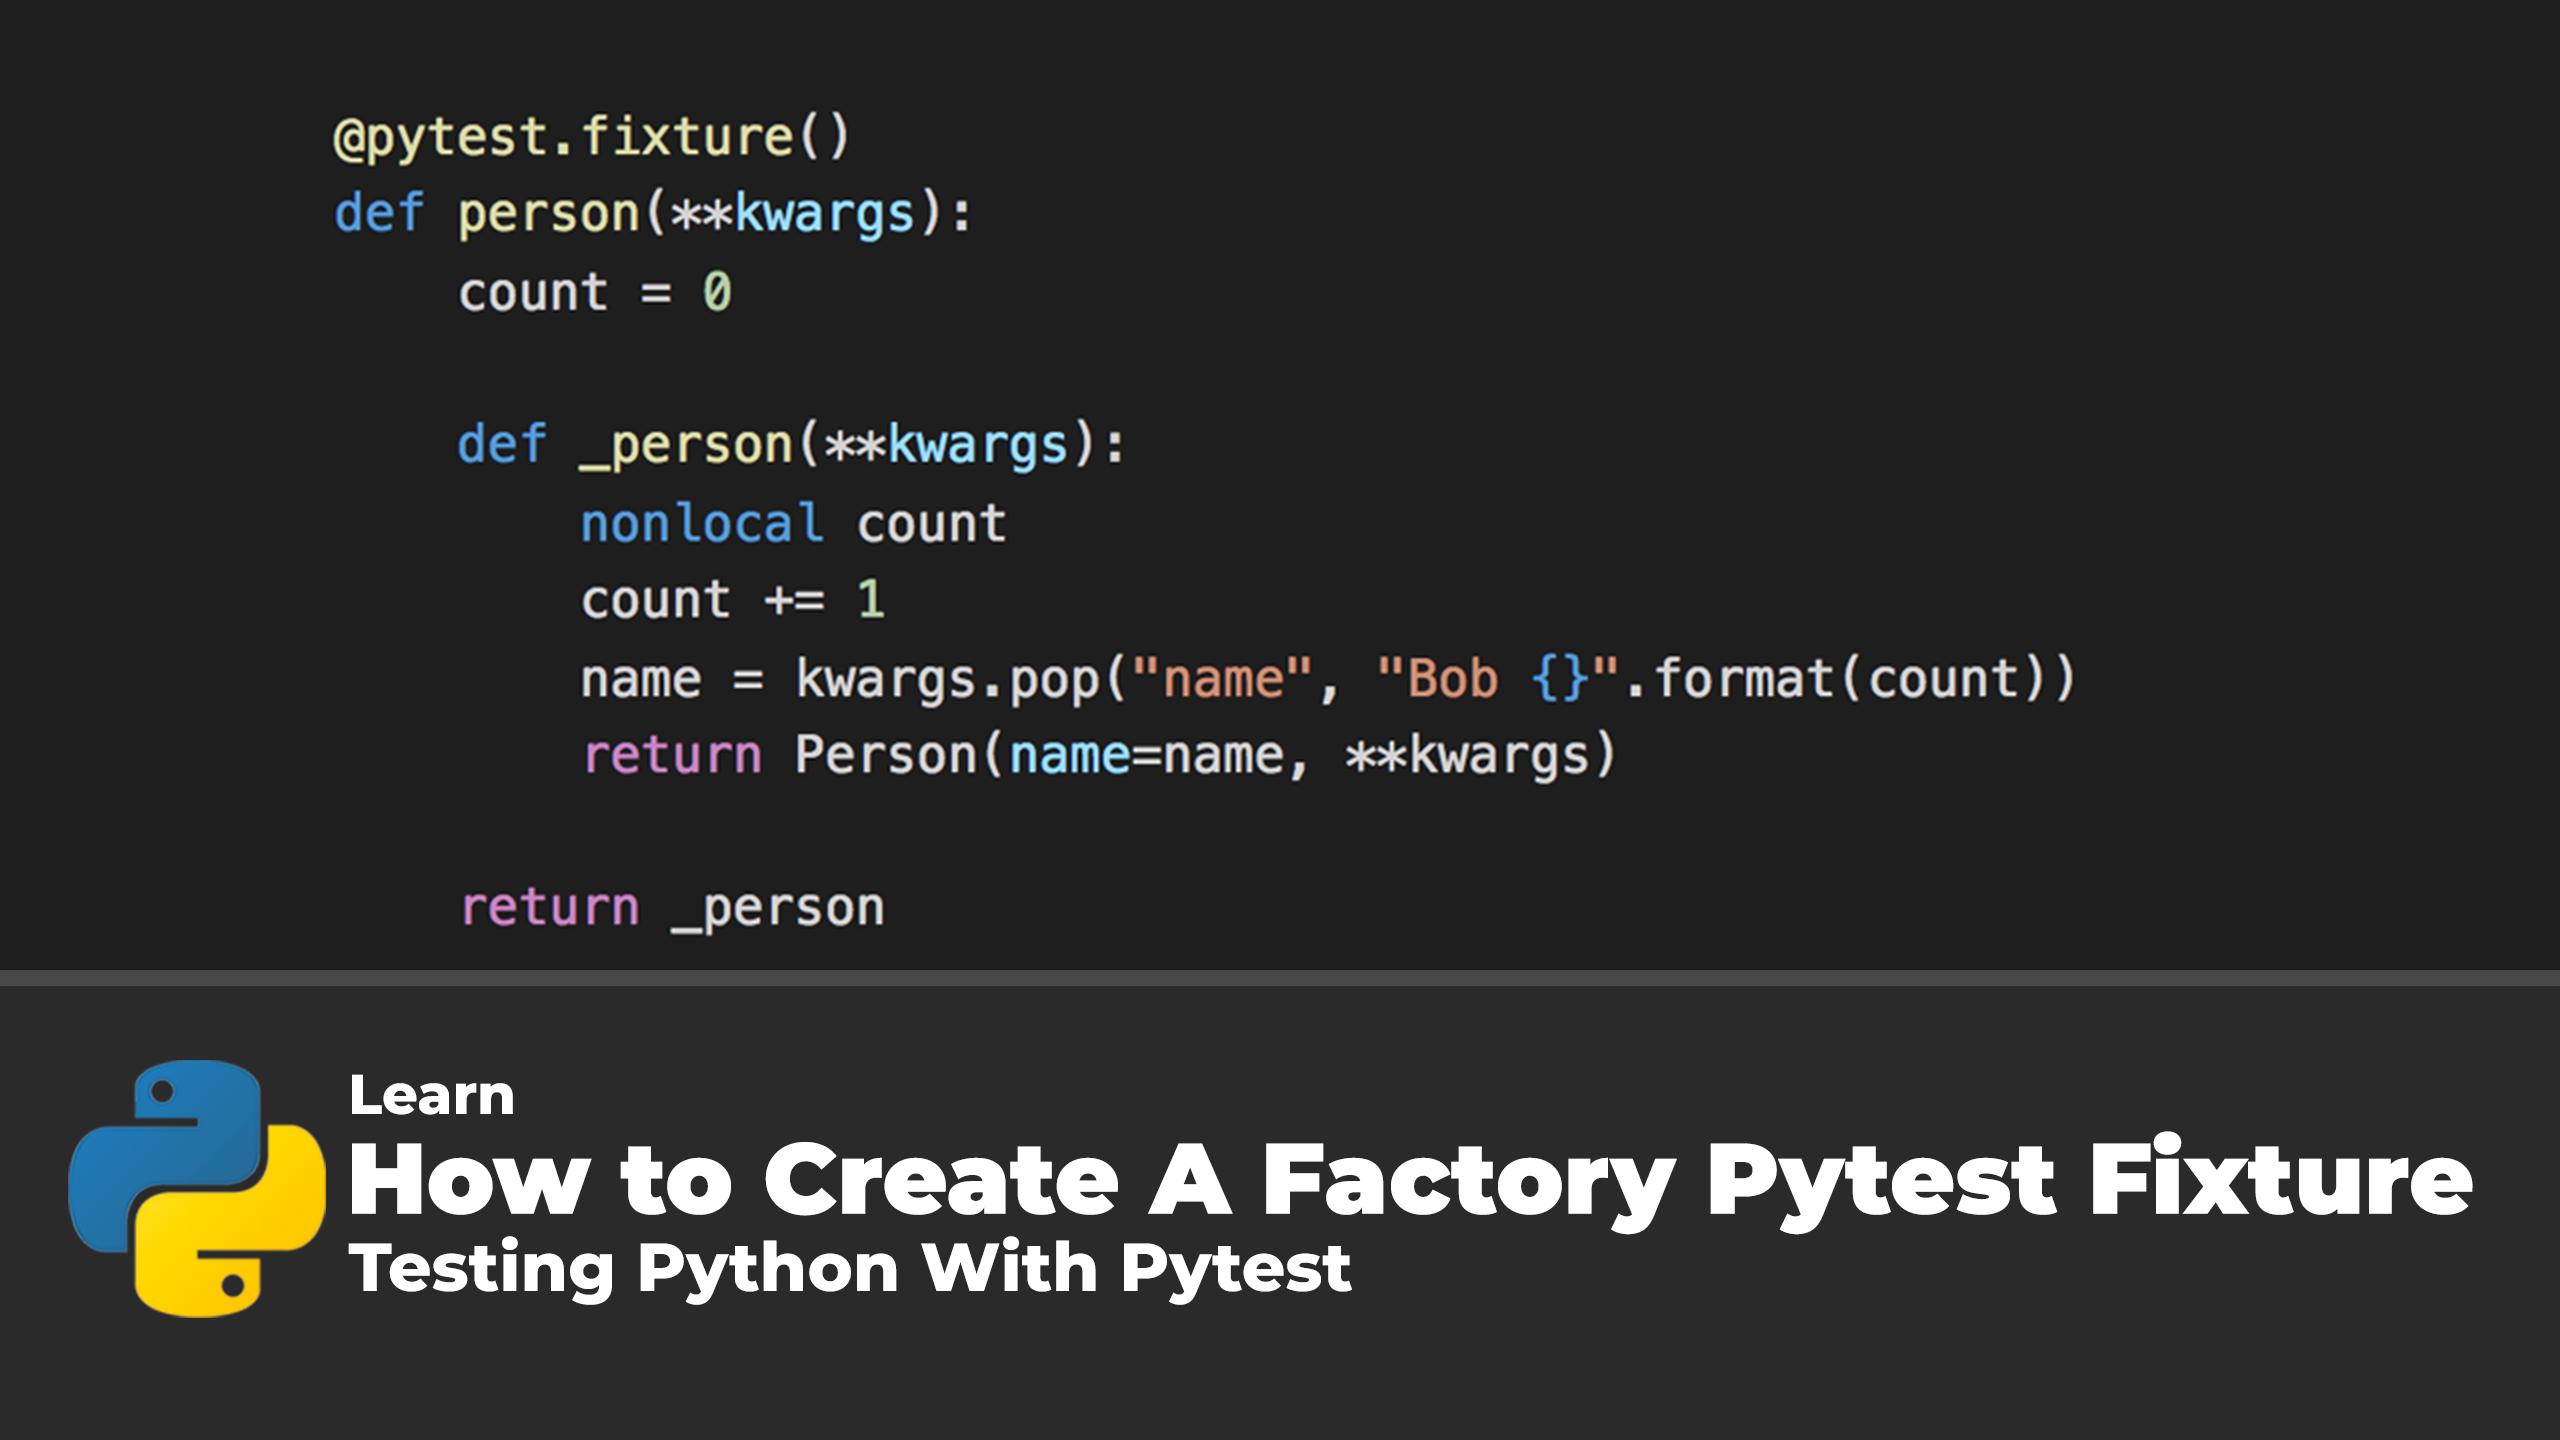 Create A Factory Pytest Fixture